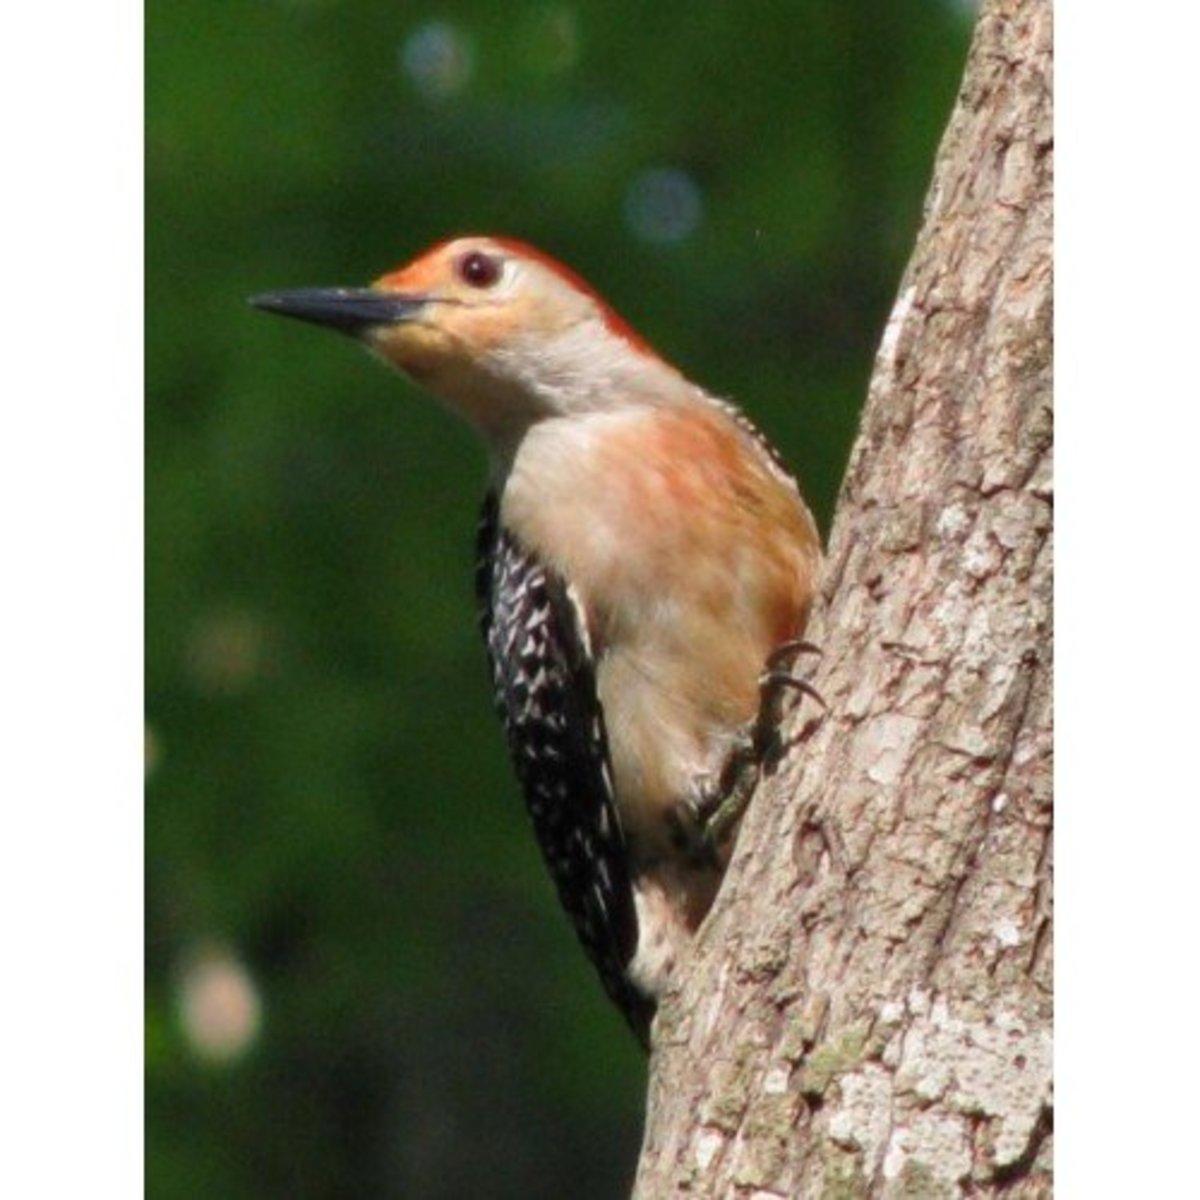 Male Red bellied woodpecker in our 9 acre habitat.